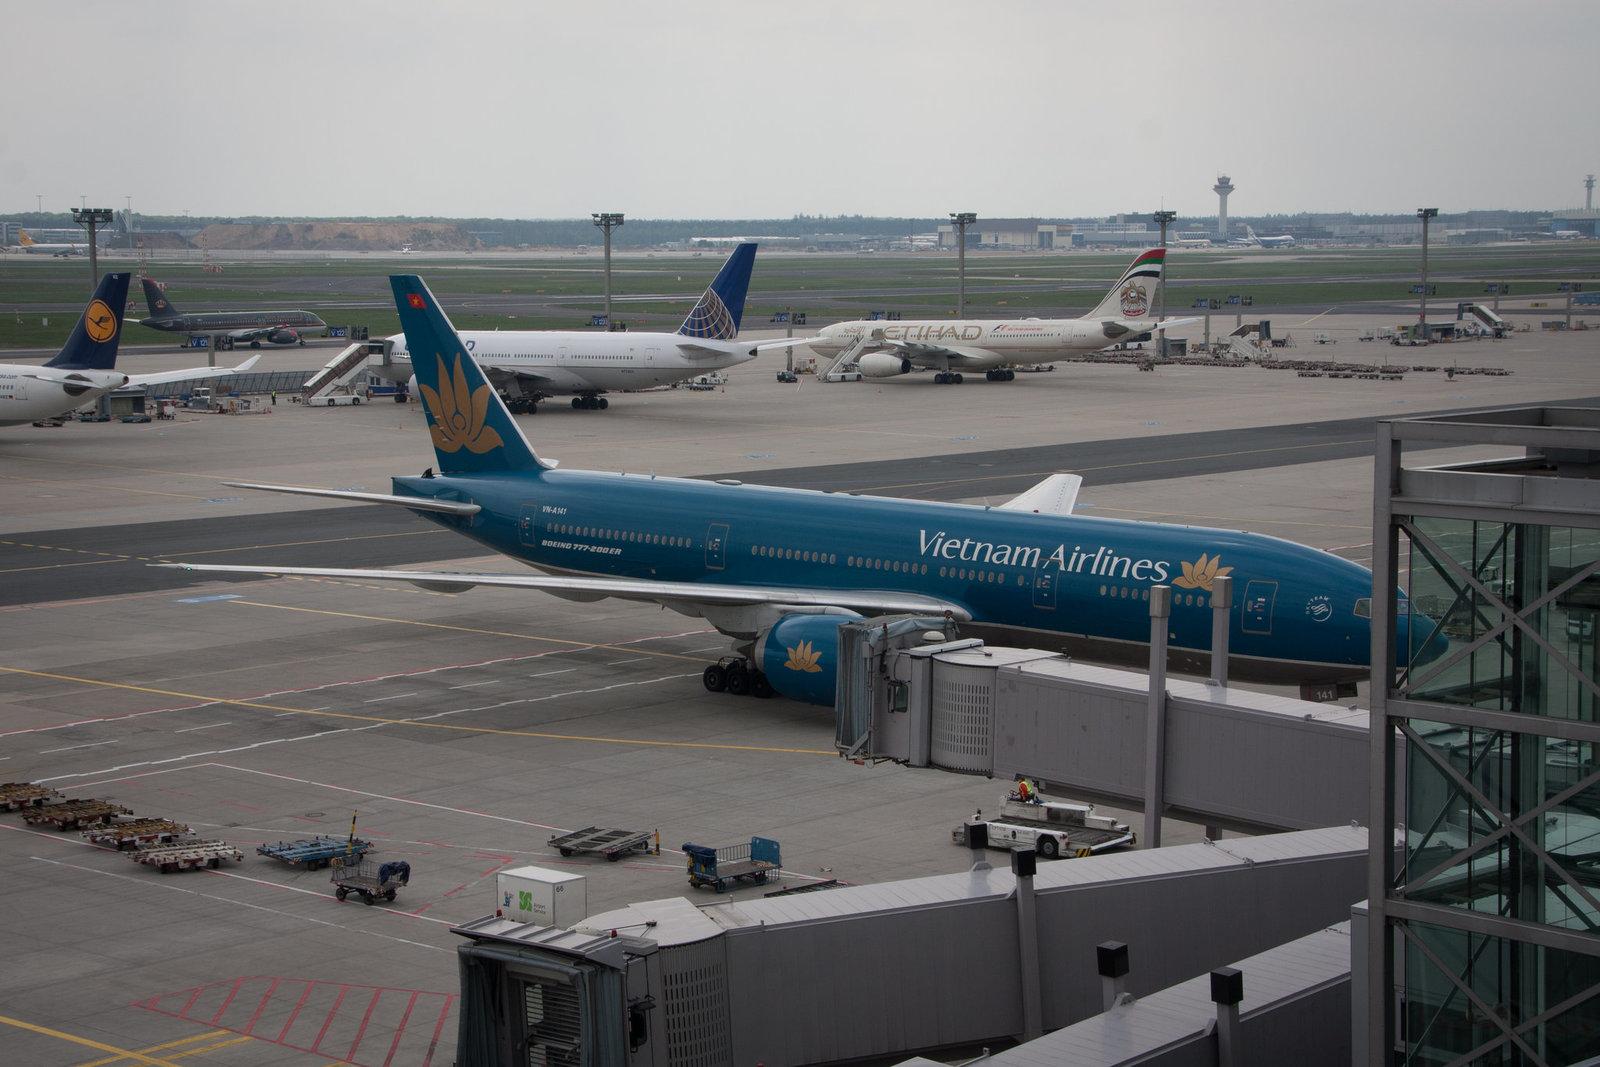 Frankfurt Airport - 01.Mai 2013